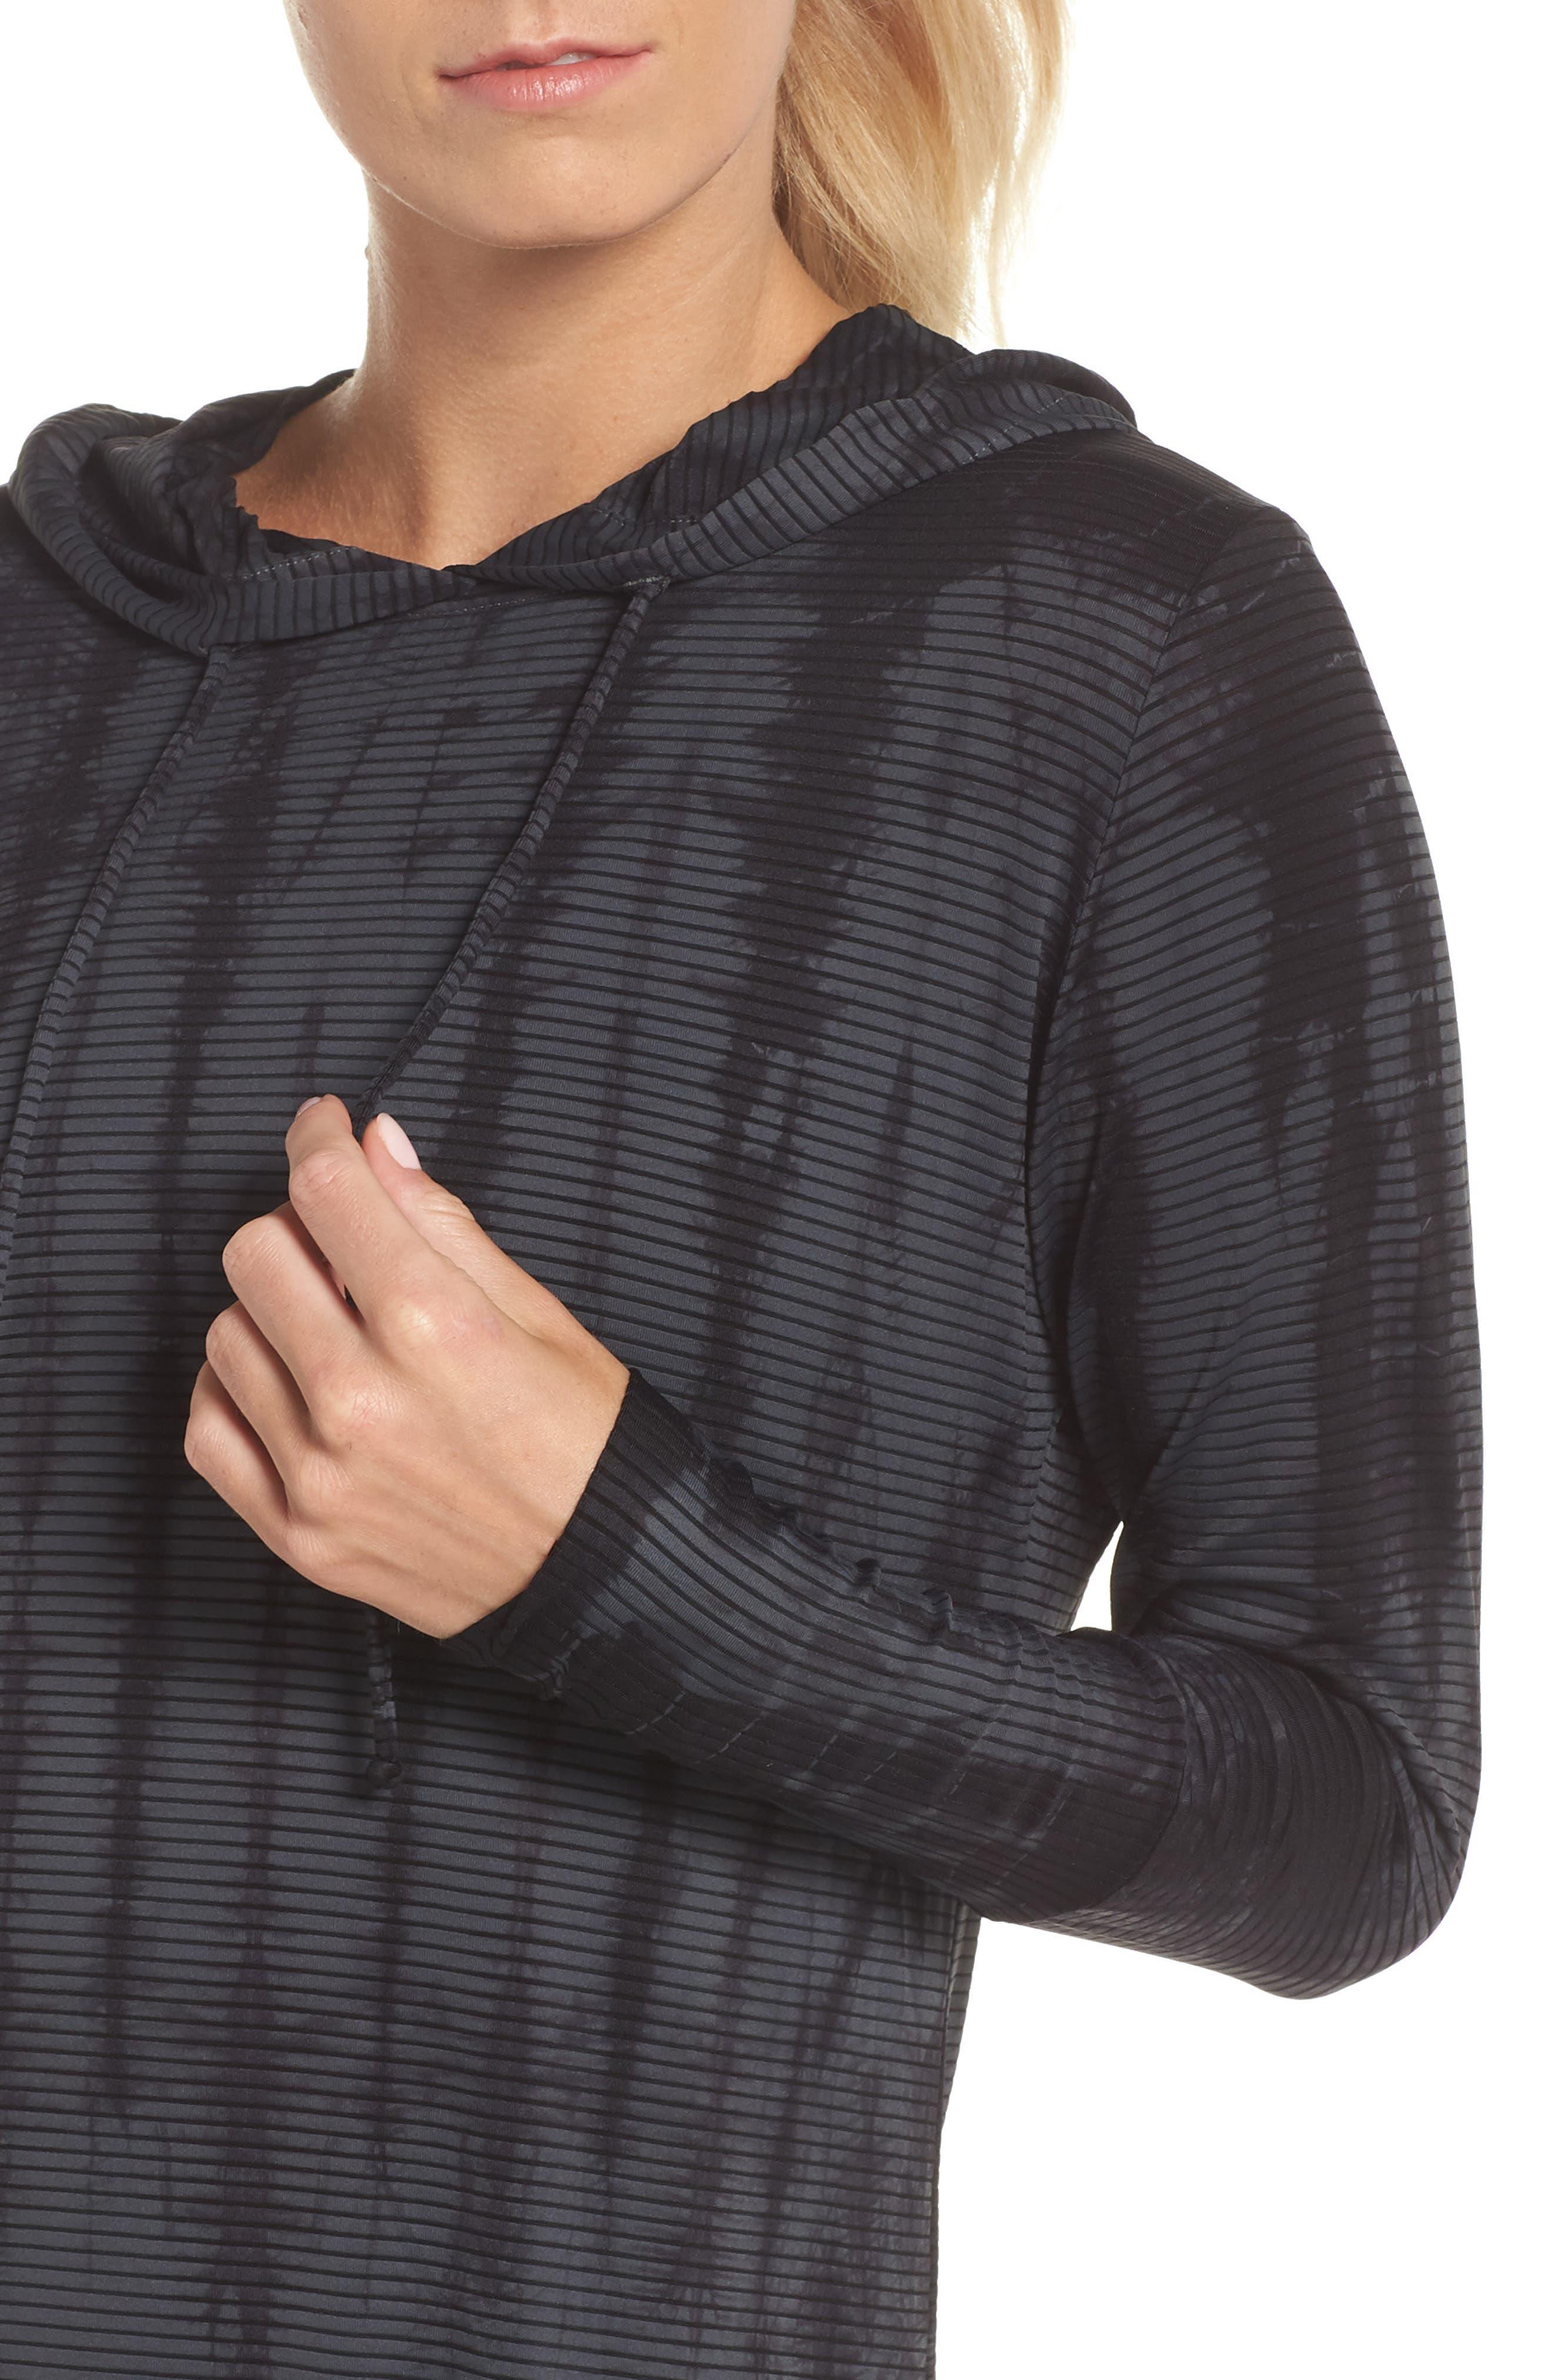 Waves Tie Dye Gray Hooded Pullover,                             Alternate thumbnail 4, color,                             DARK GREY